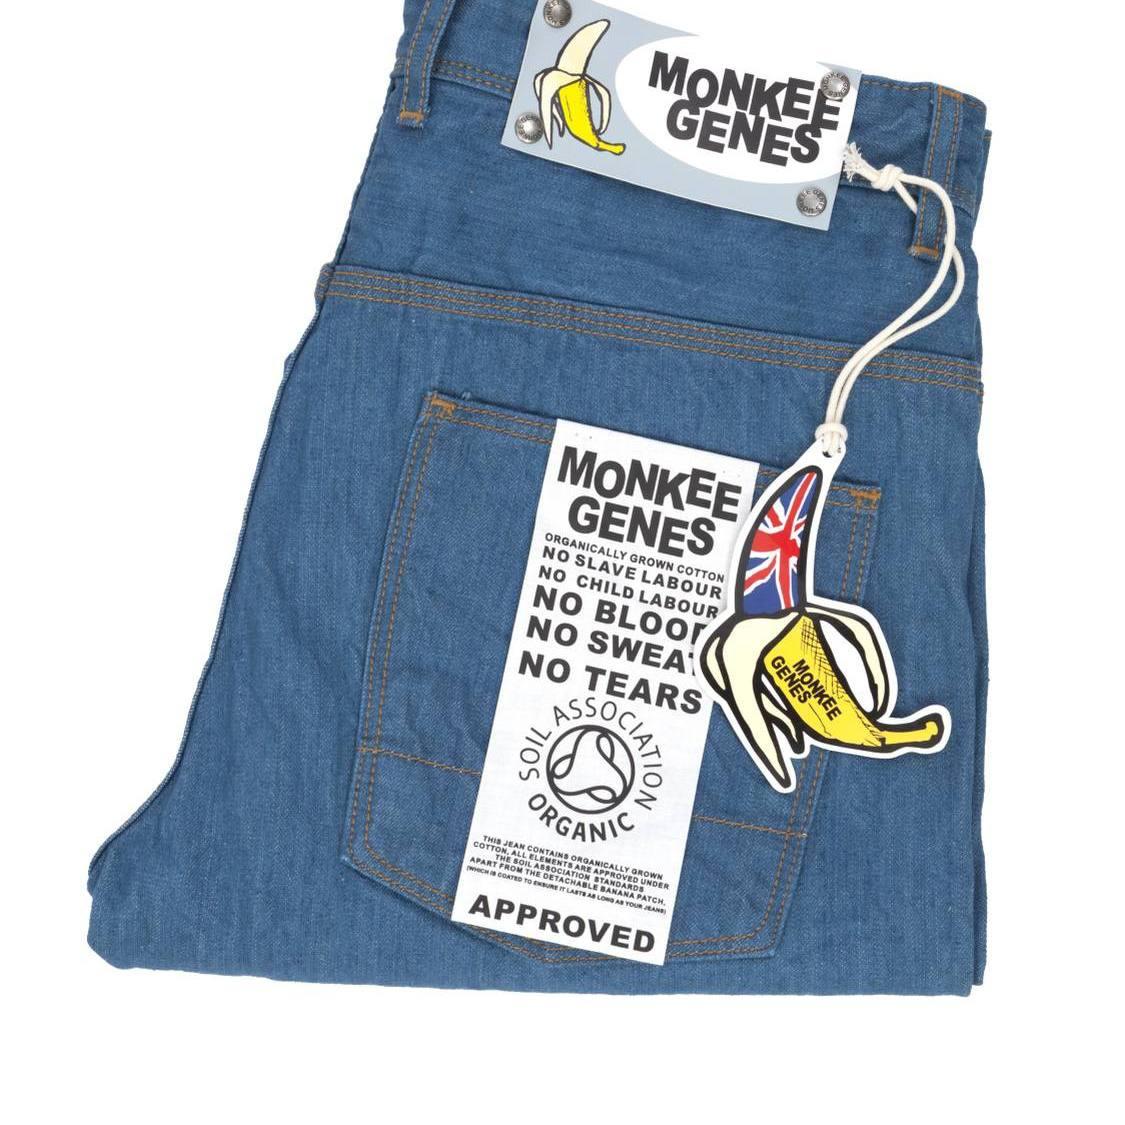 monkee-jeans.jpg